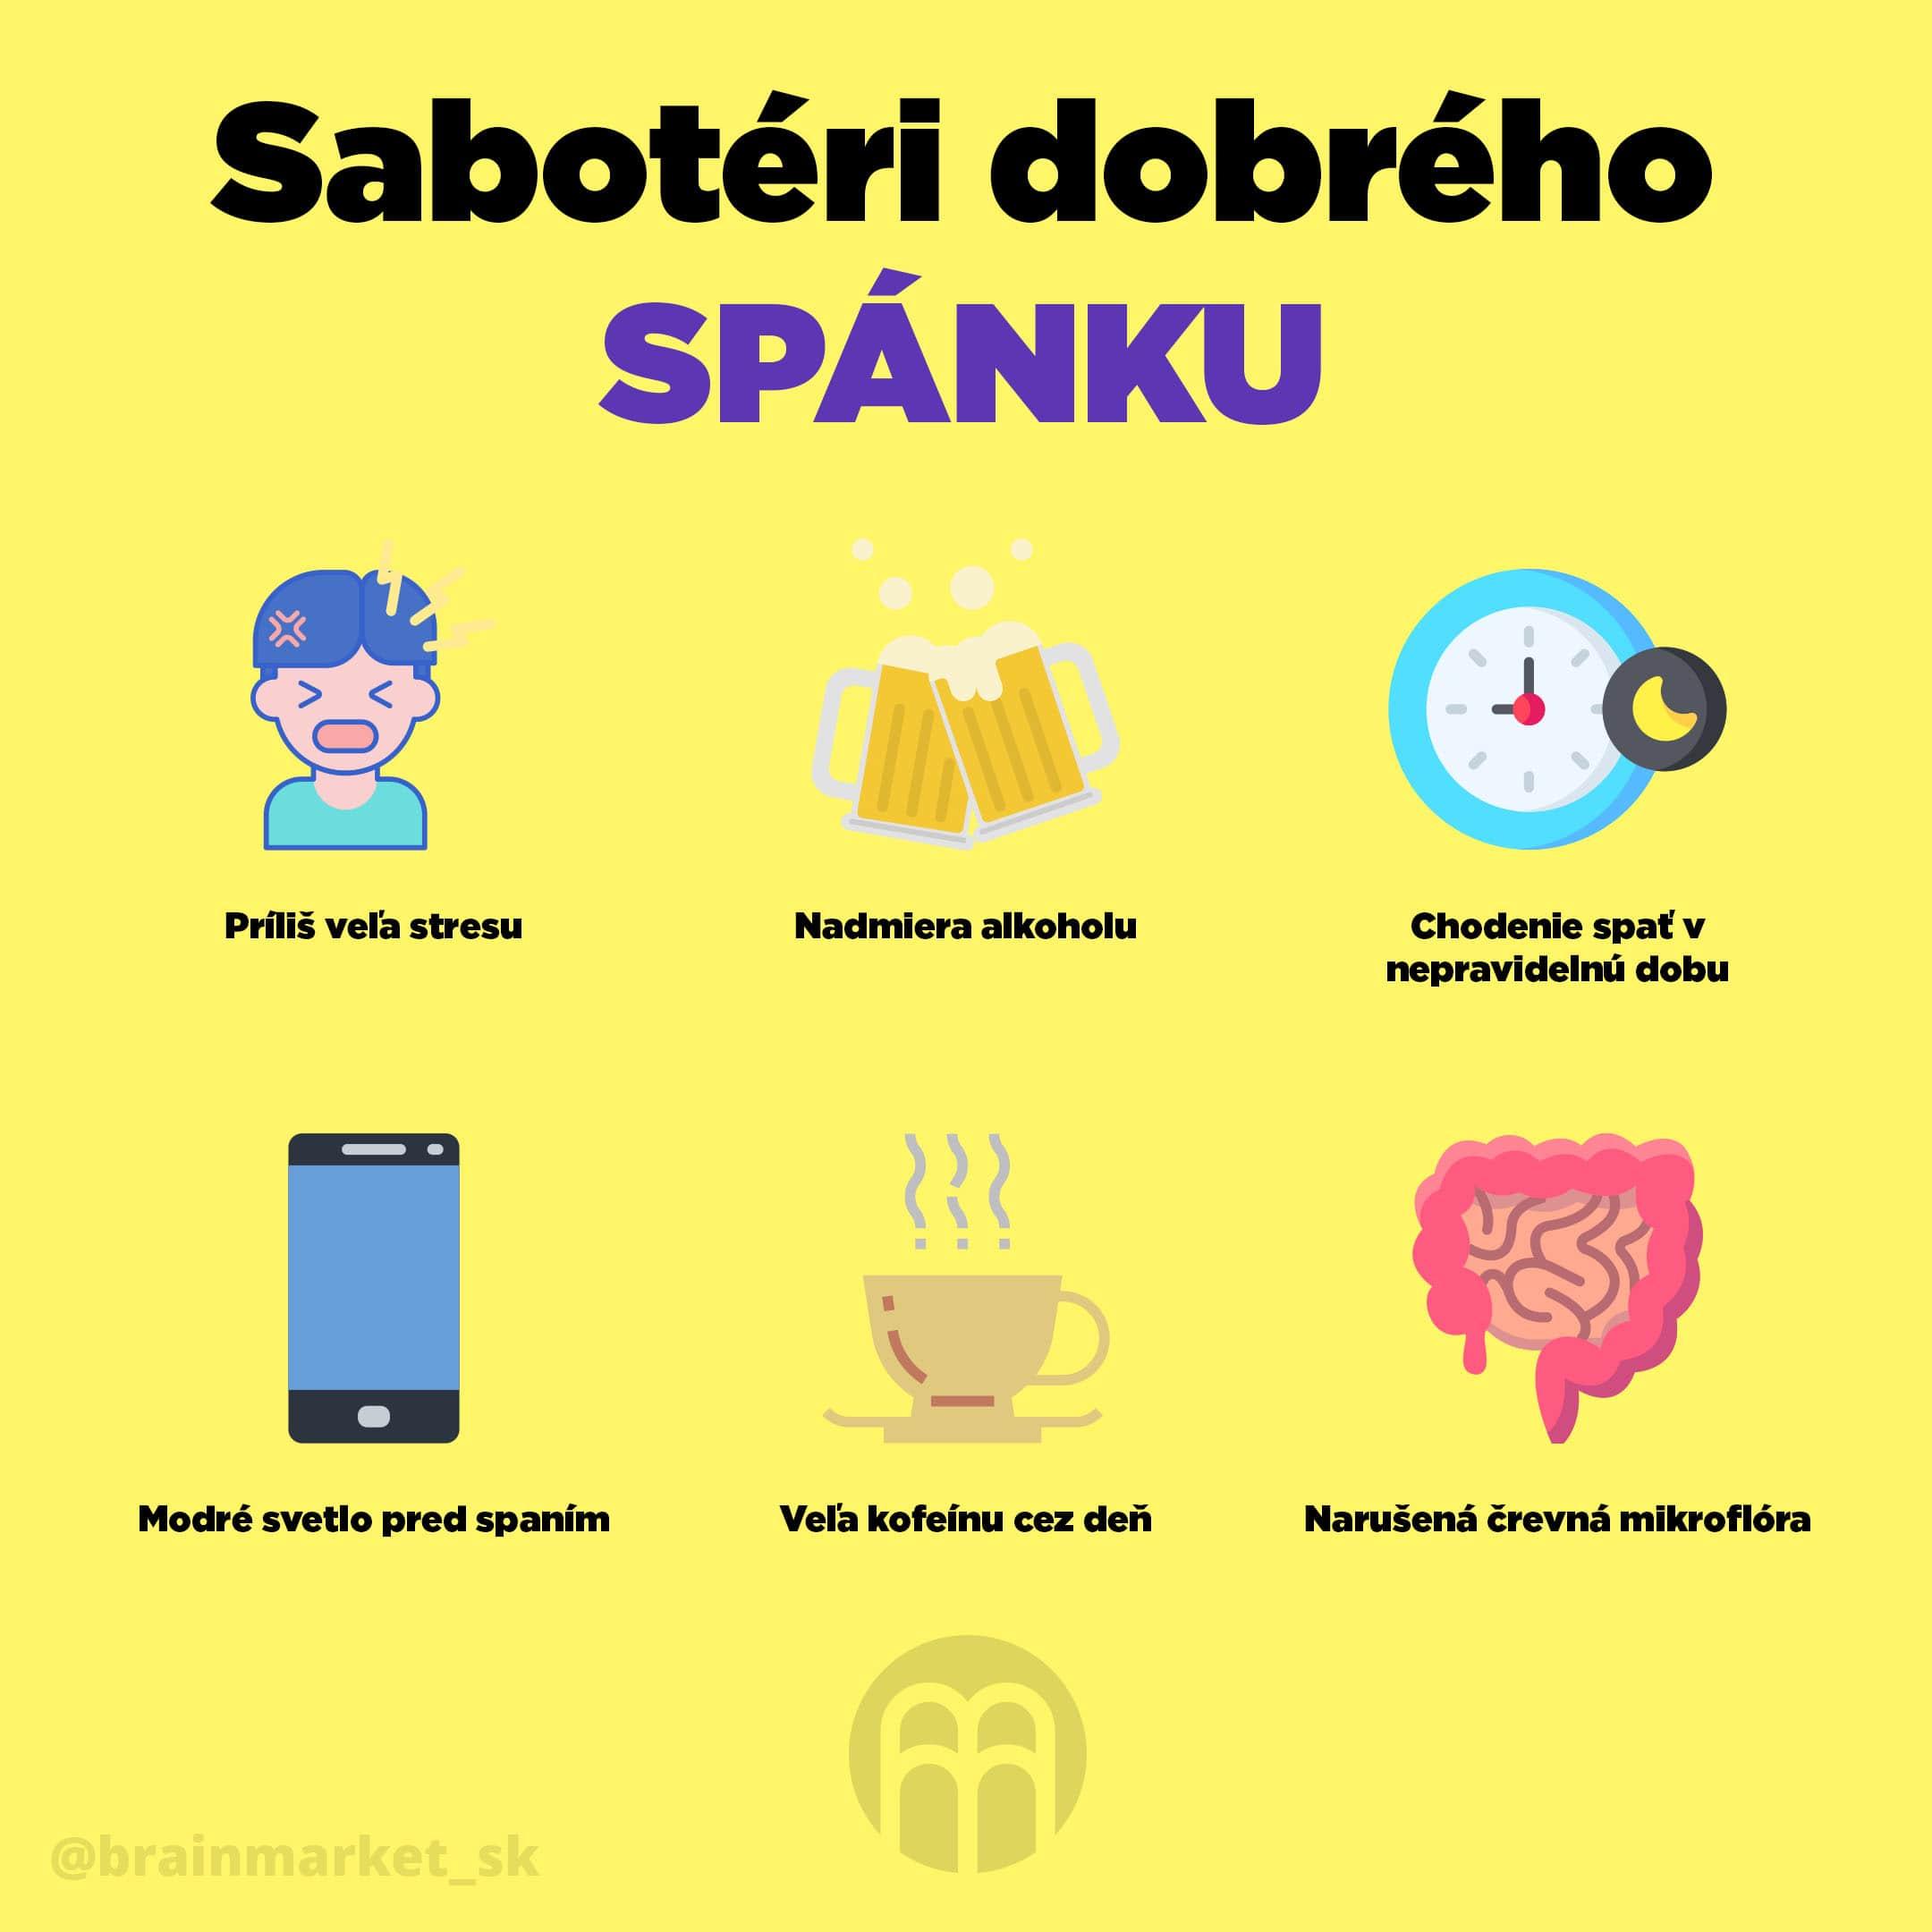 saboteri_dobreho_spanku_SK_Infografika_Instagram_BrainMarket